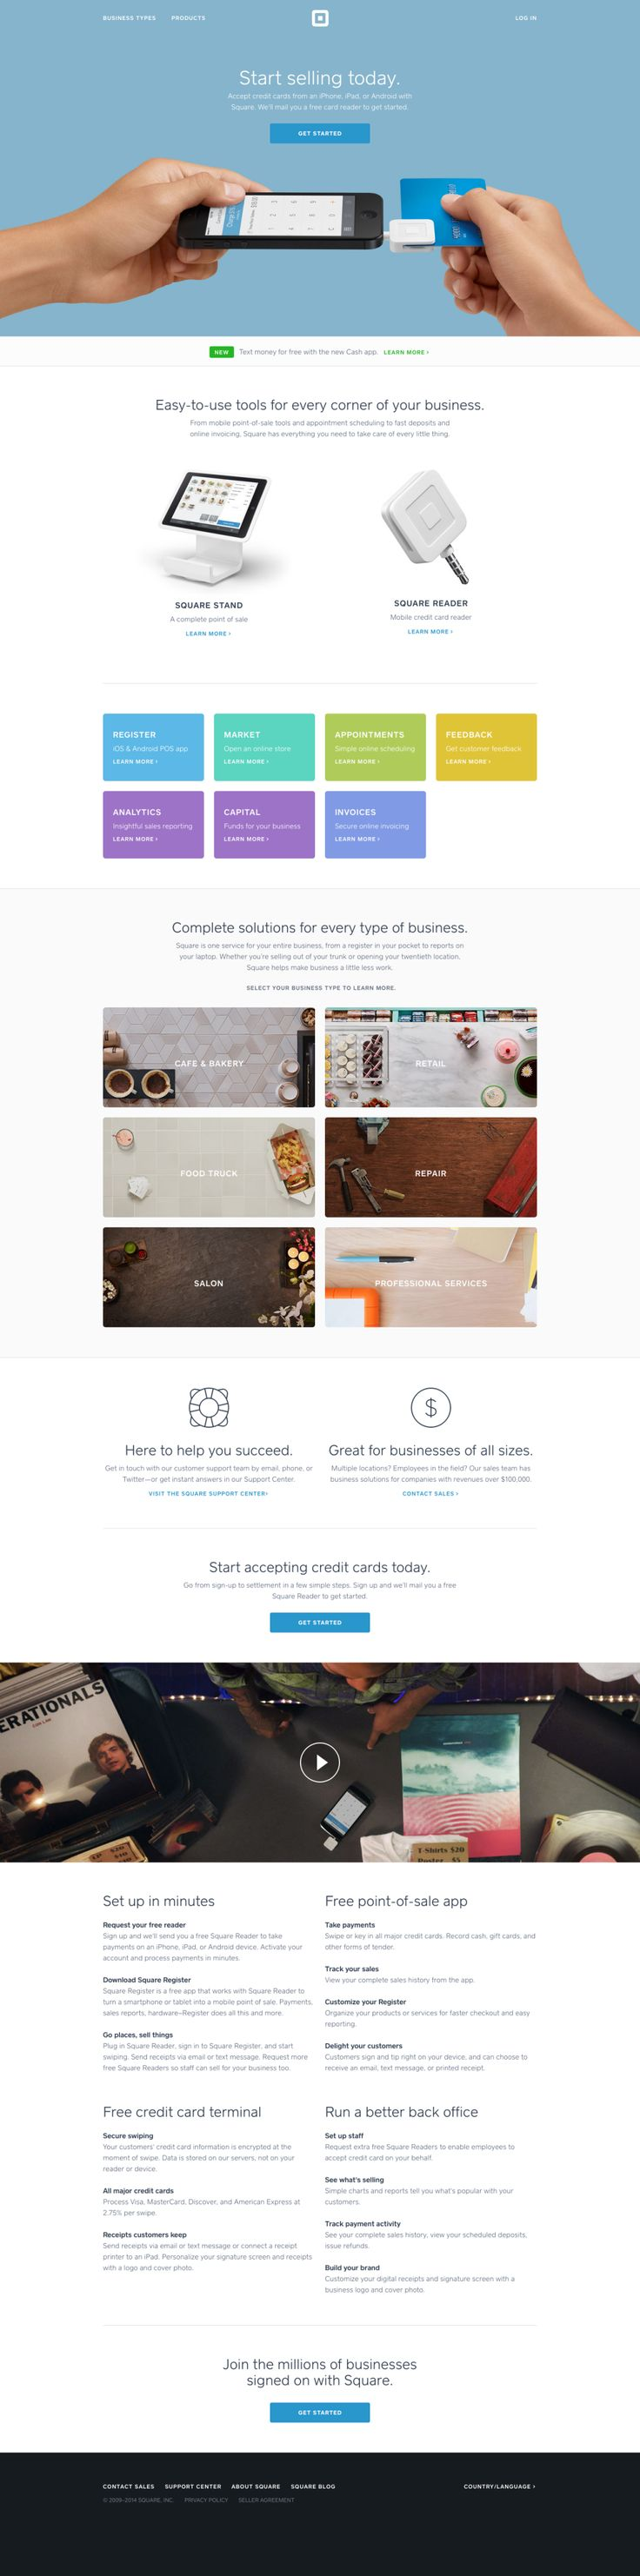 new squareup website